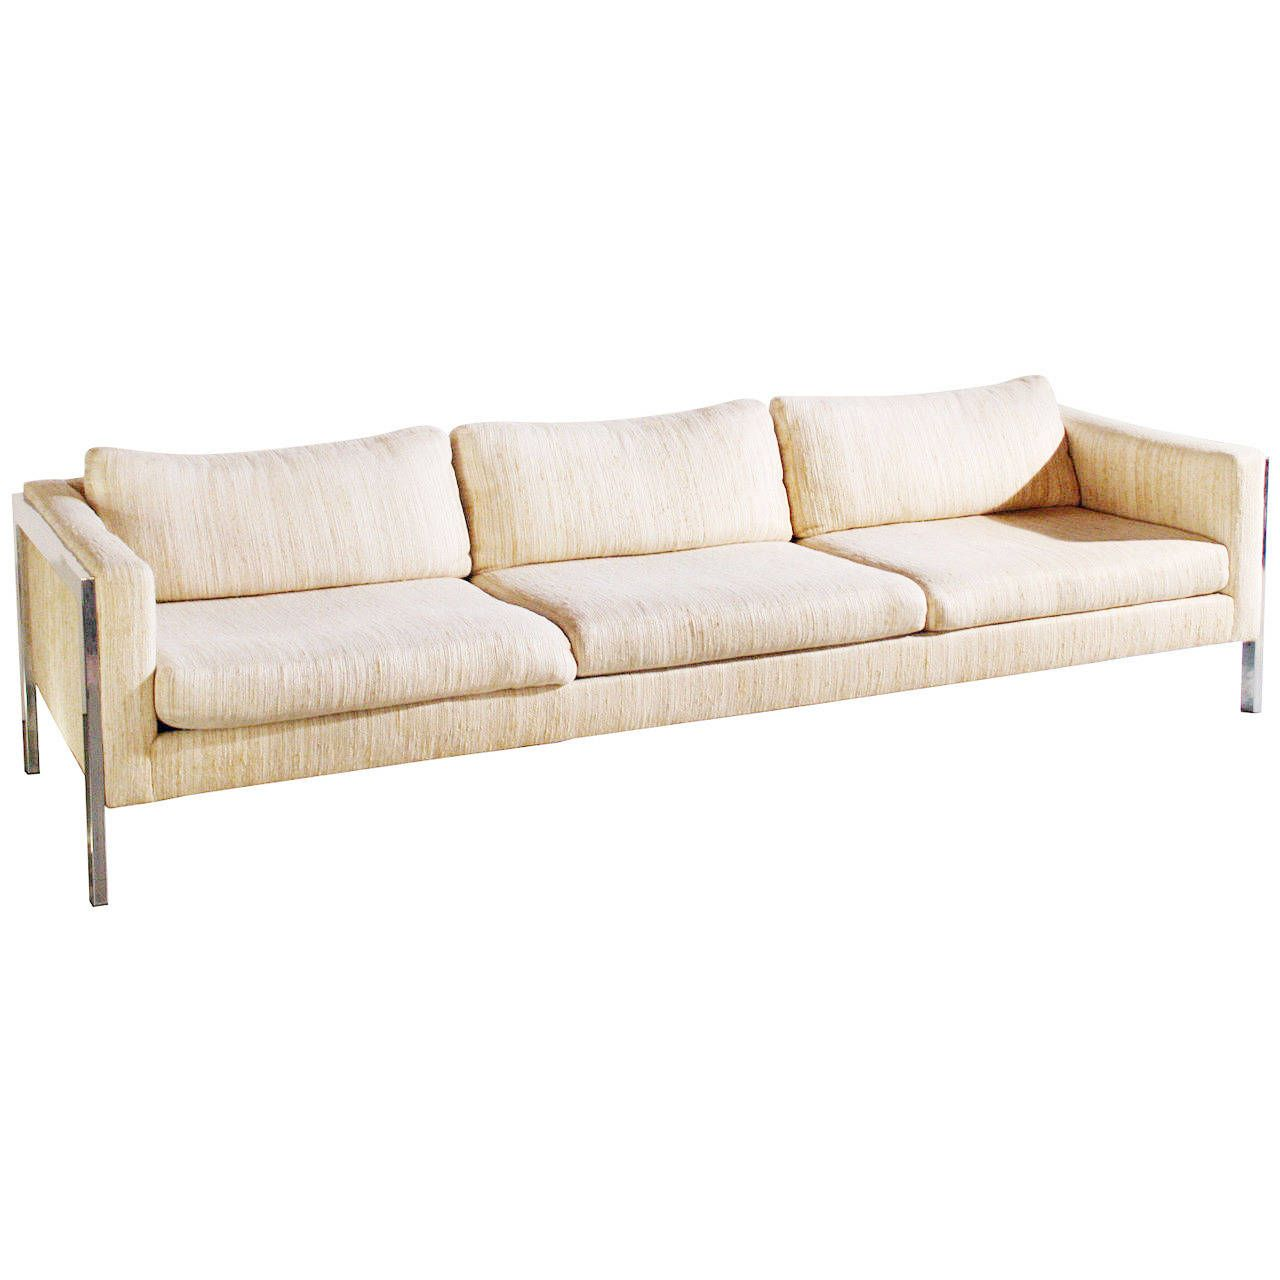 Milo Baughman Chrome Sofa Cream sofa and Modern